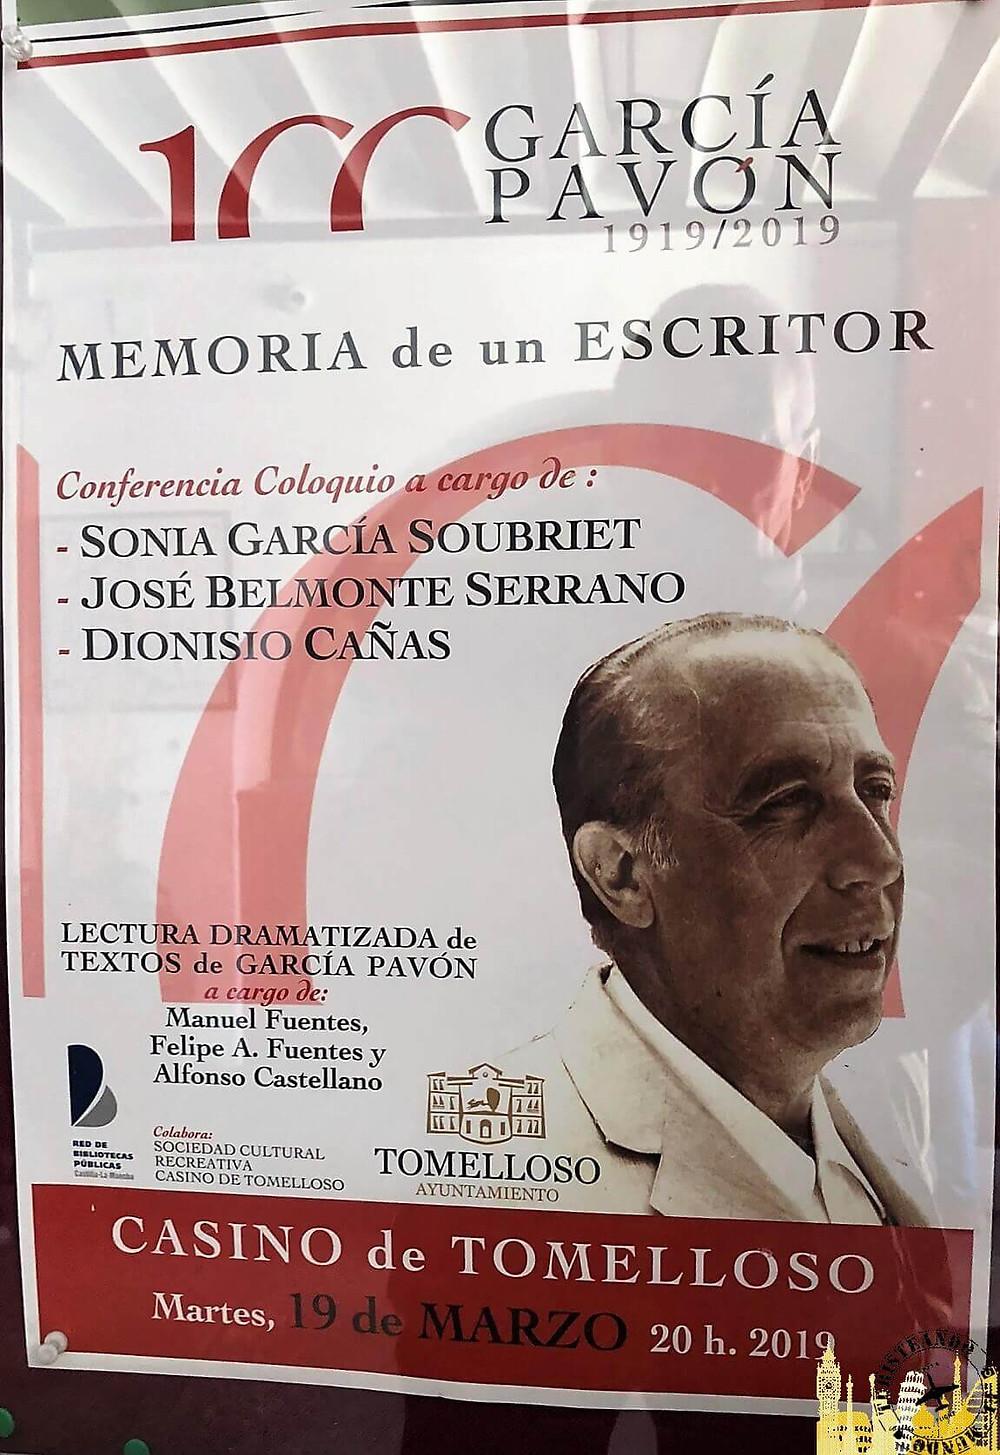 Tomelloso (Castilla la Mancha). Centenario García Pavón